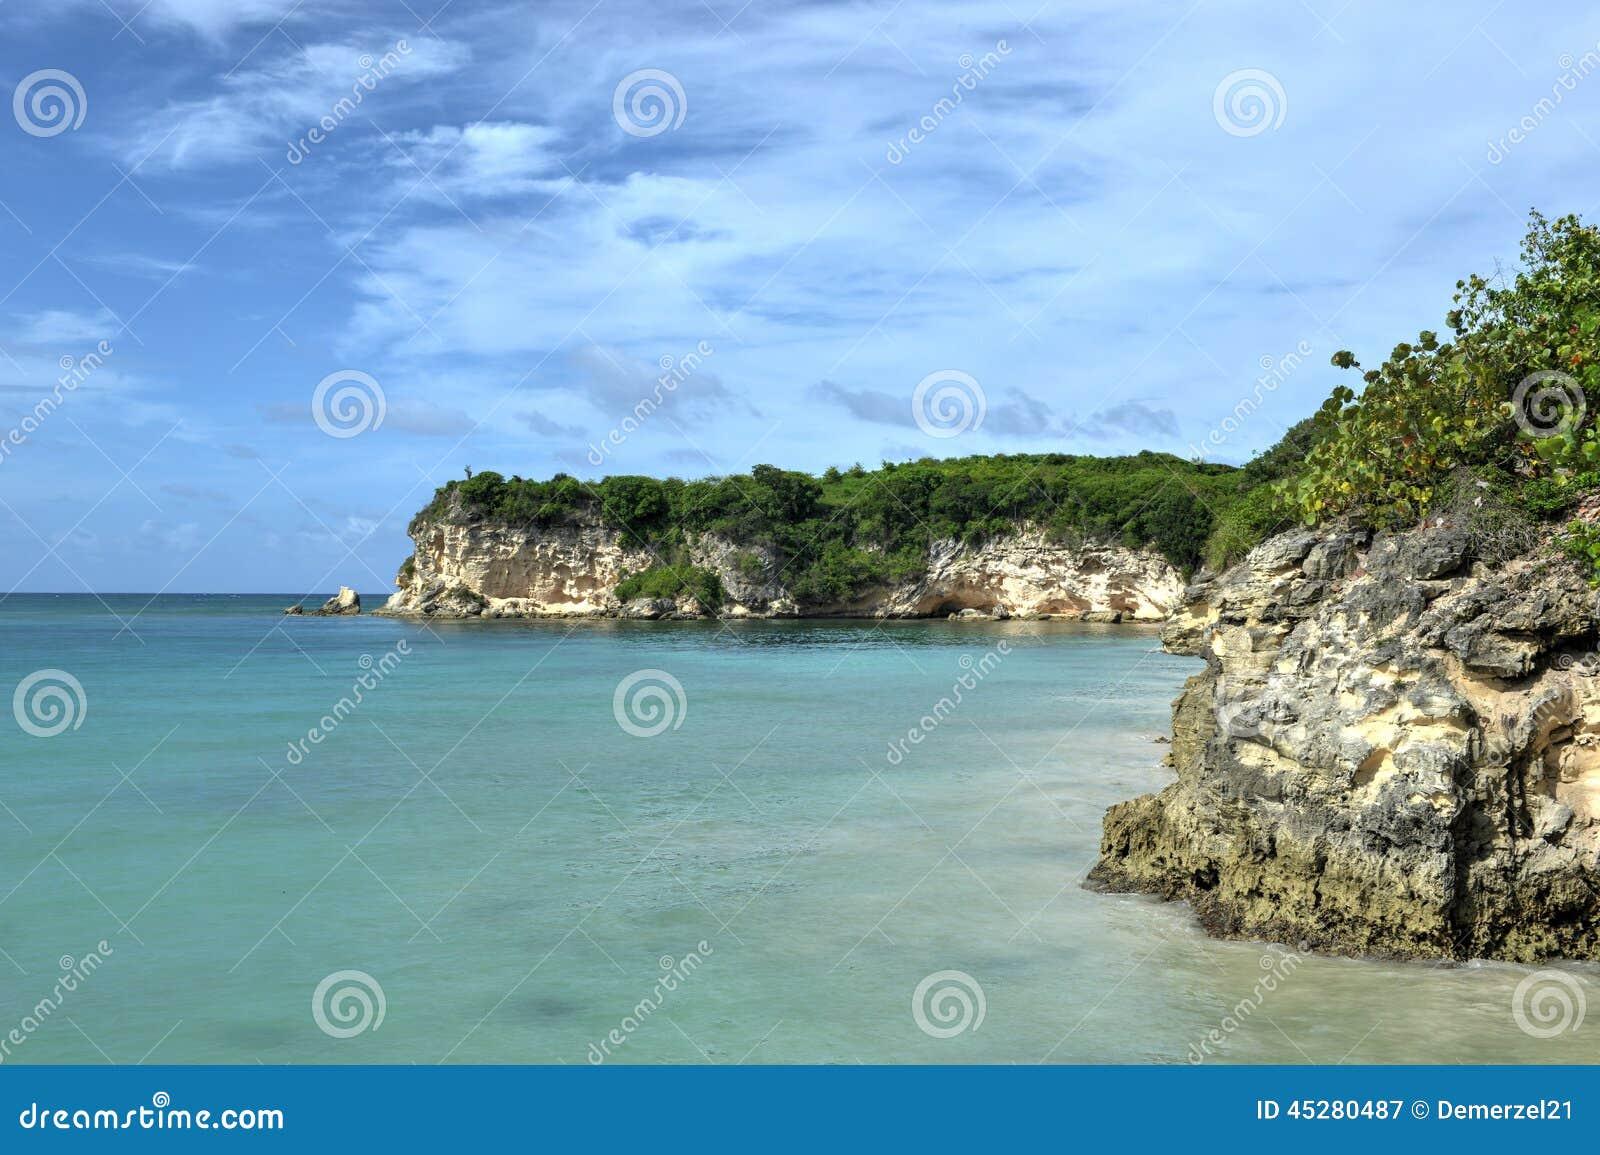 macao beach punta cana dominican republic stock photo. Black Bedroom Furniture Sets. Home Design Ideas